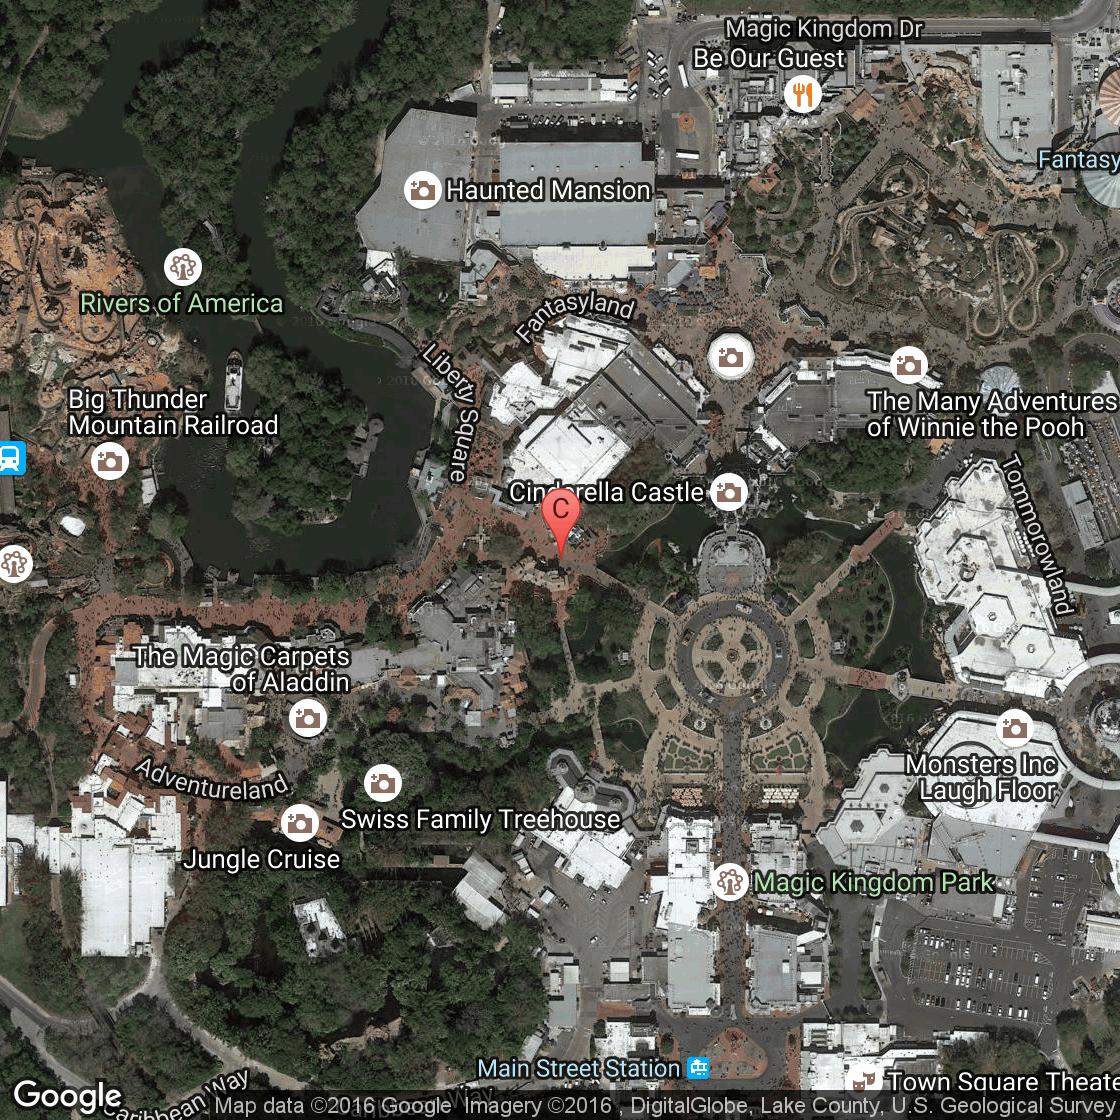 Comparison of Walt Disney World & Walt Disneyland | USA Today on